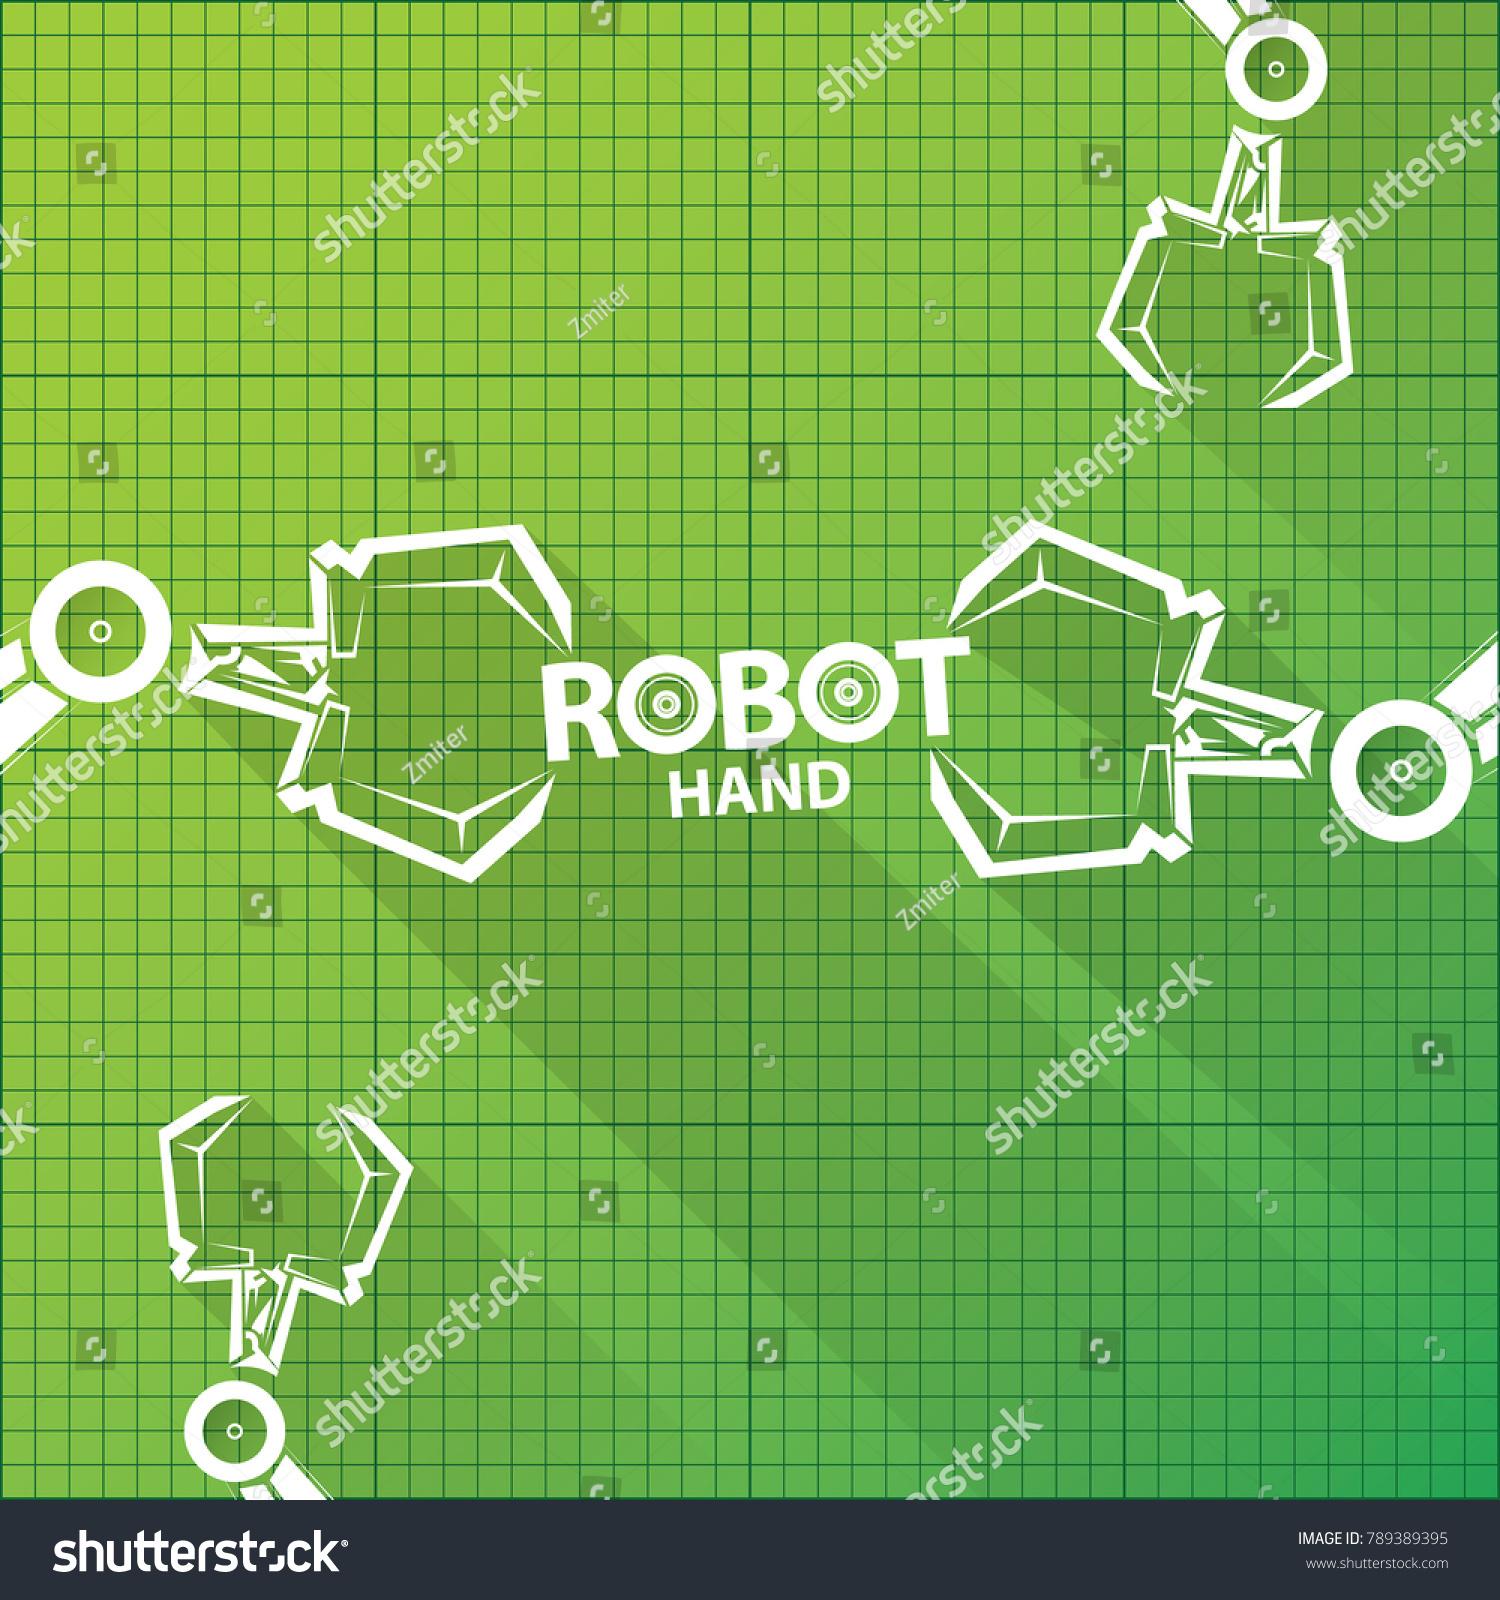 Vector robotic arm symbol on green stock vector 789389395 shutterstock vector robotic arm symbol on green blueprint paper background robot hand technology background design malvernweather Gallery